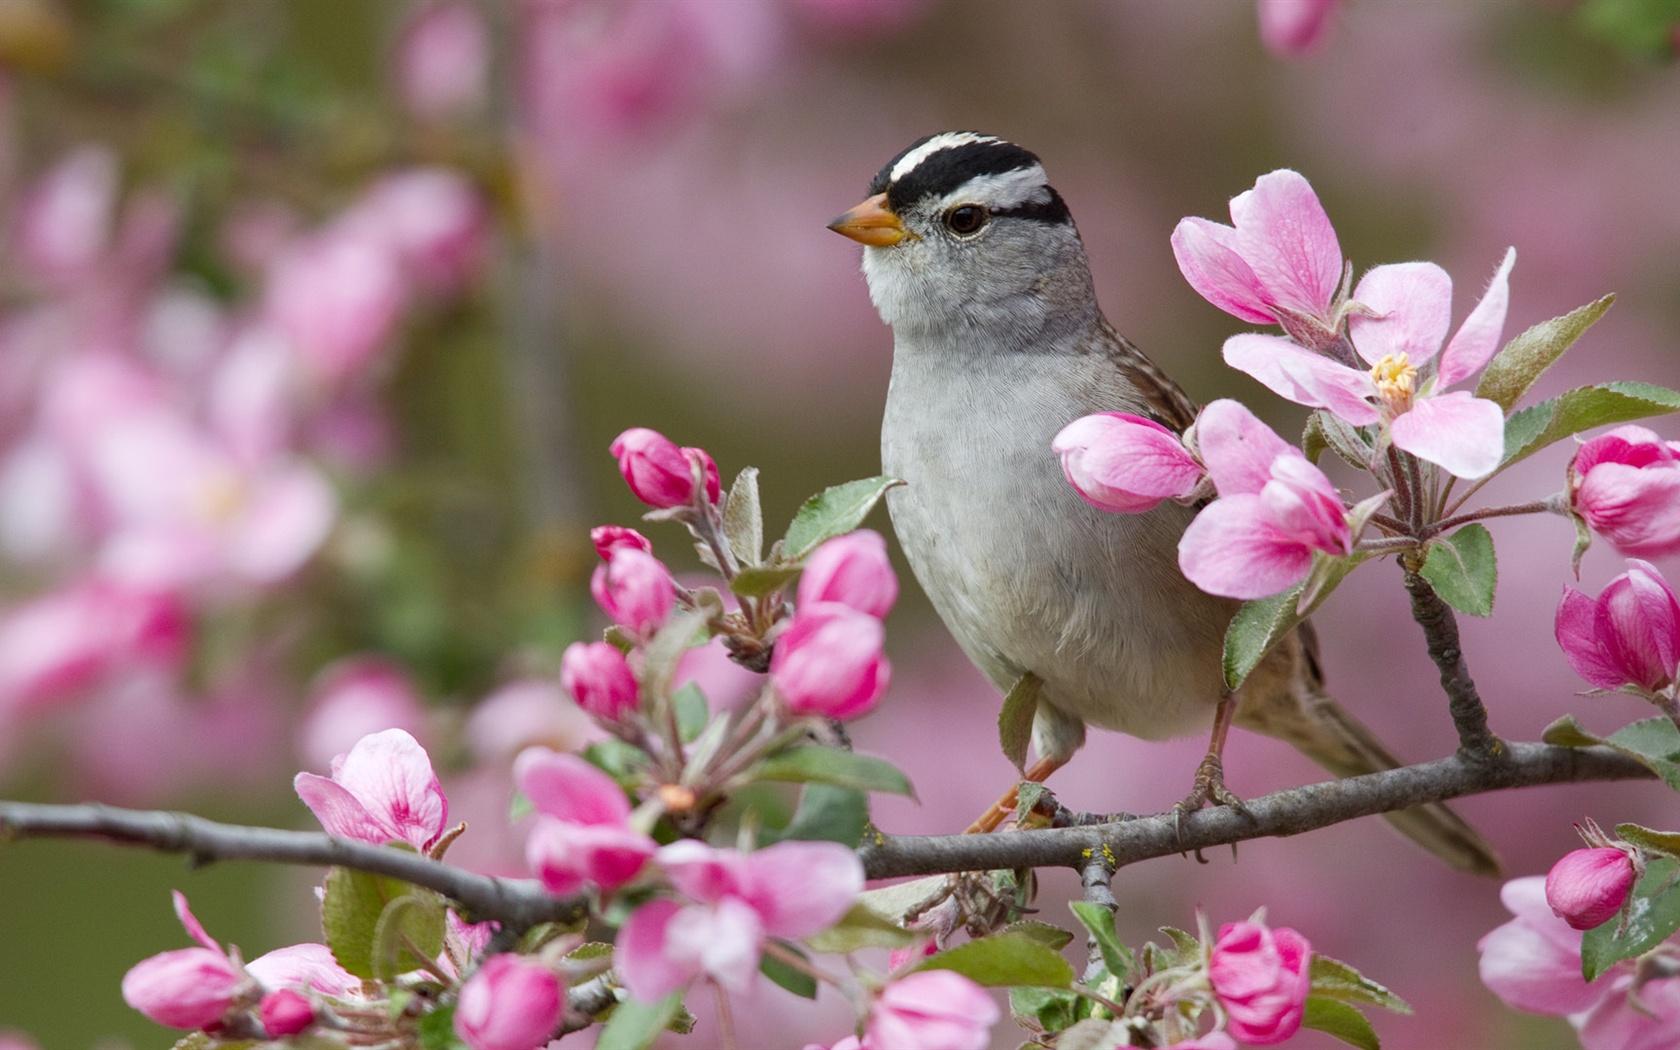 Peach Blossom Frühling Und Die Vögel 1920x1080 Full Hd 2k